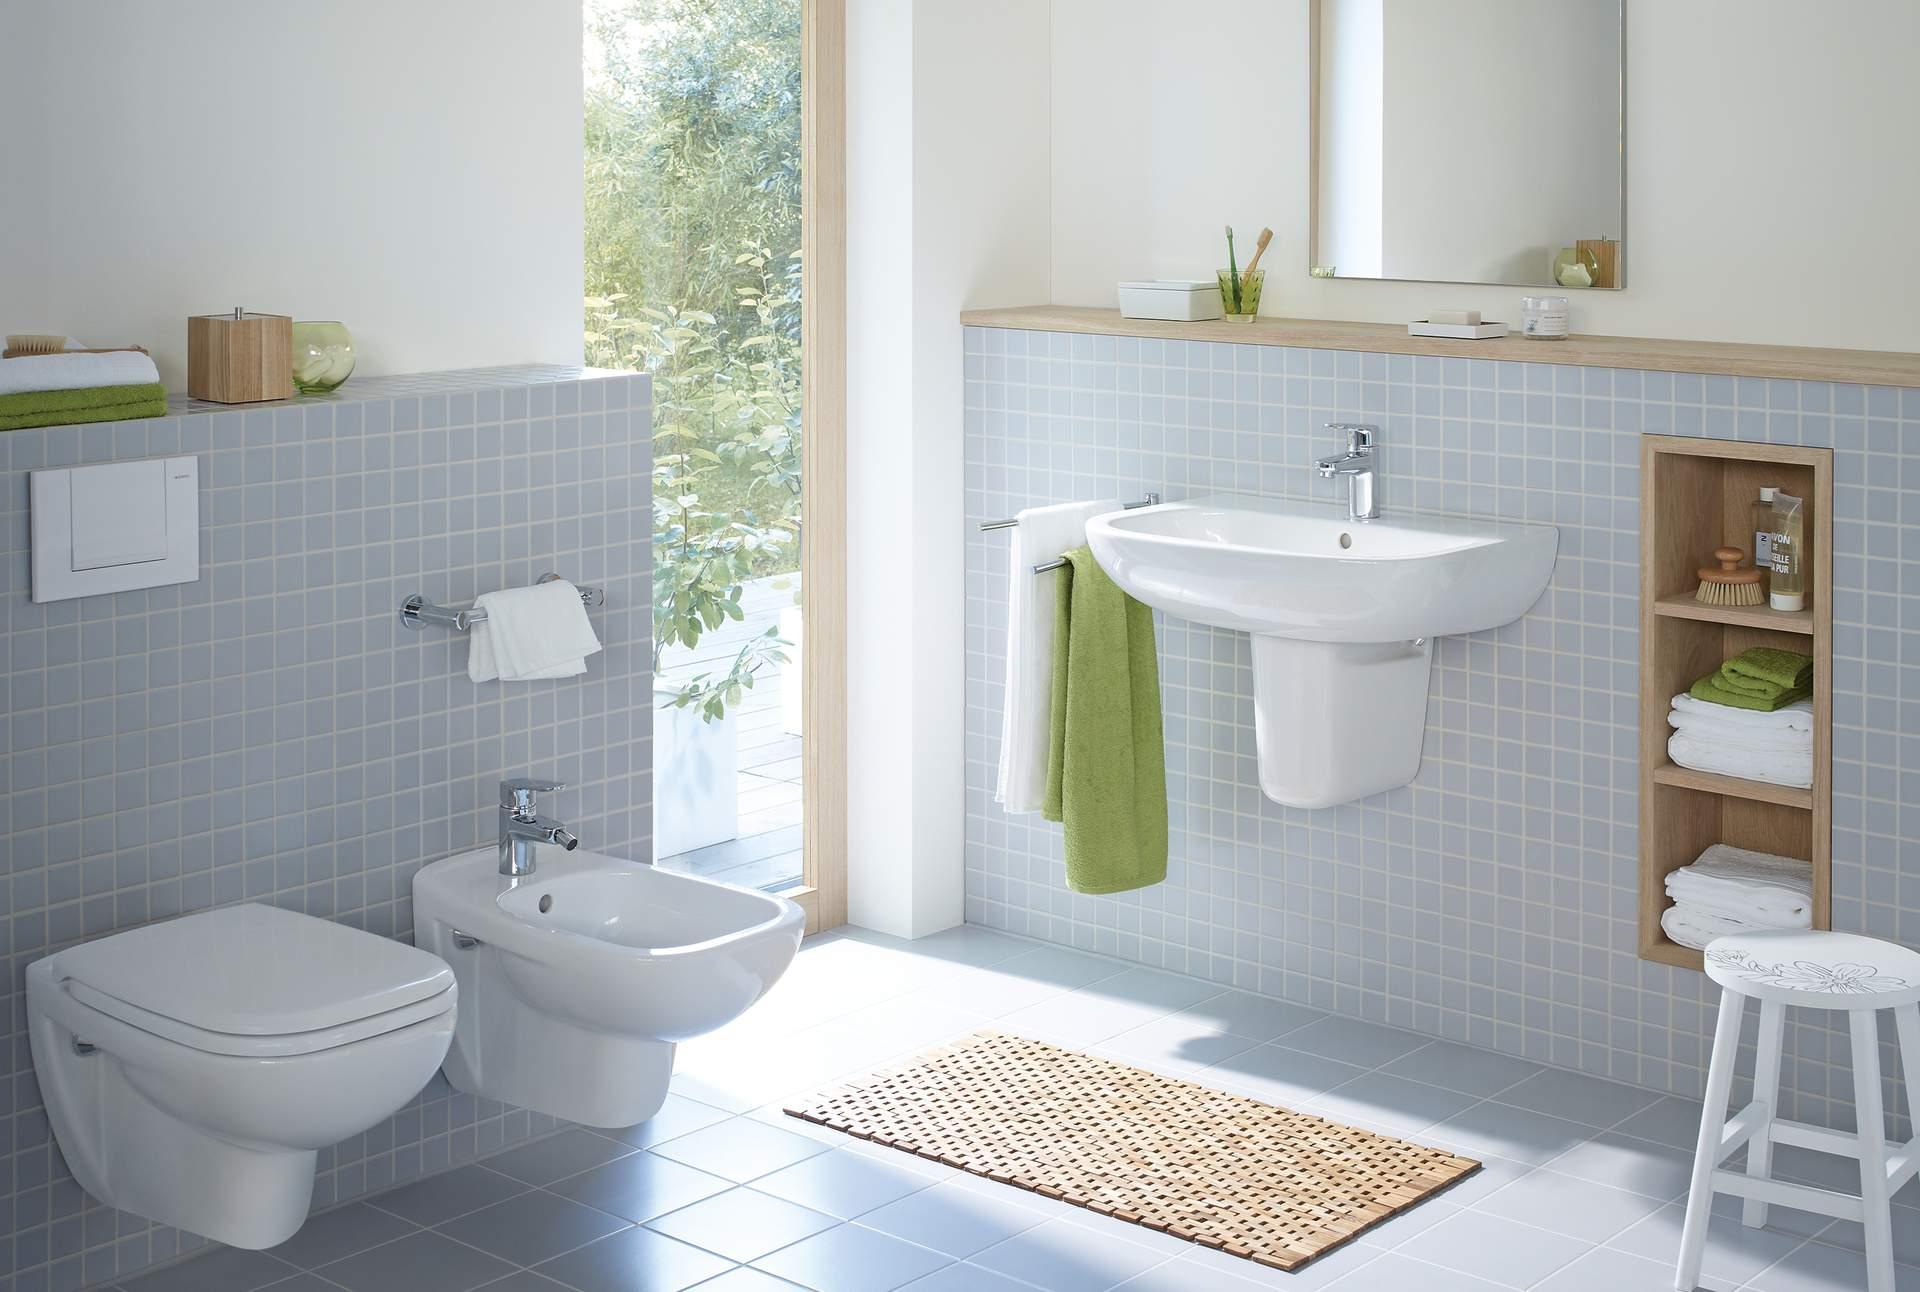 Duravit D-Code: Bathtubs, bathroom sinks & more | Duravit